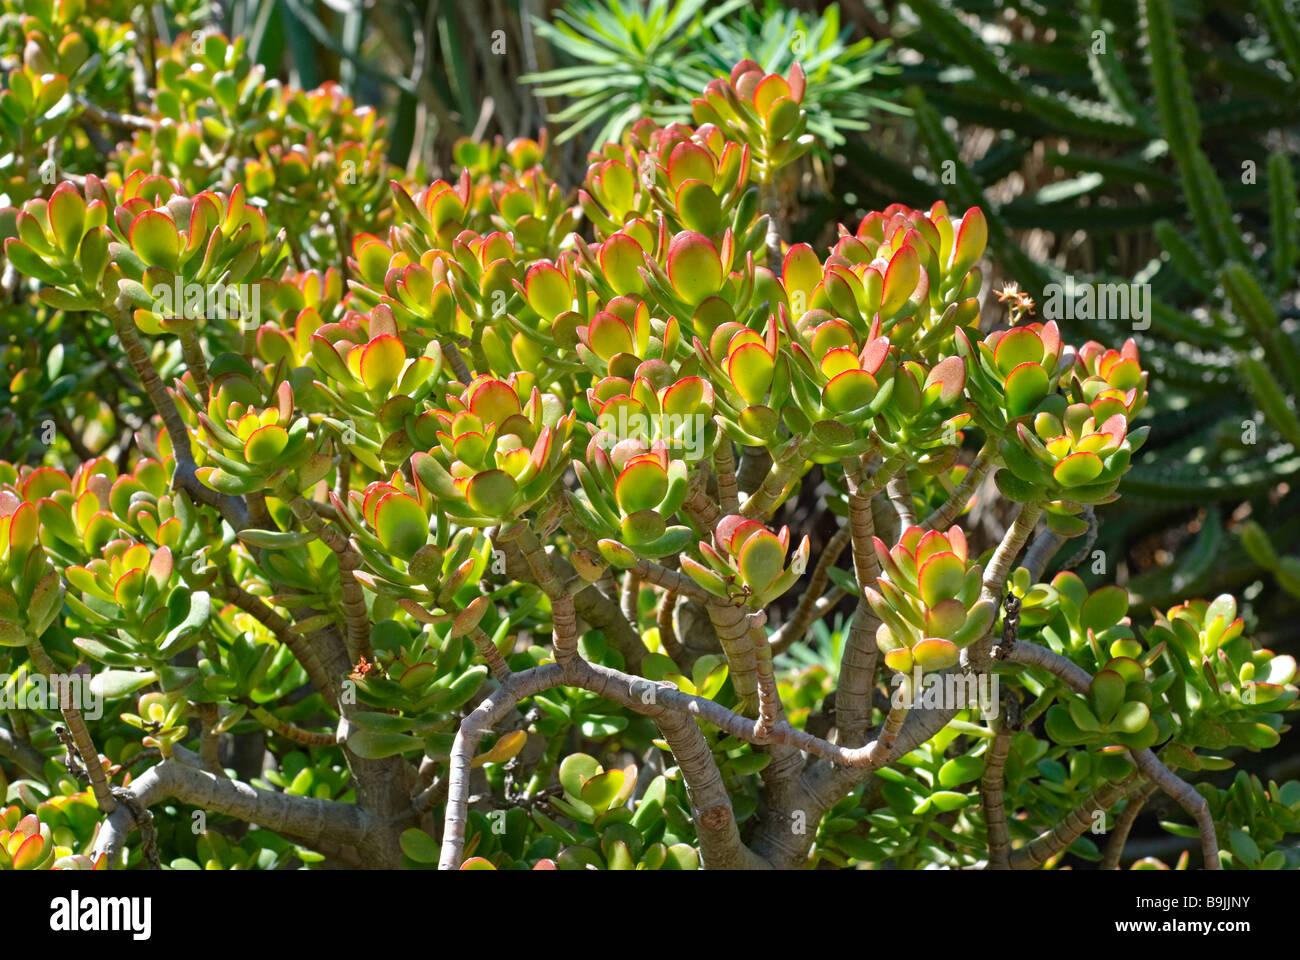 Crassula Crosby Red Succulent Stock Photo Royalty Free Image 23152135 Alamy